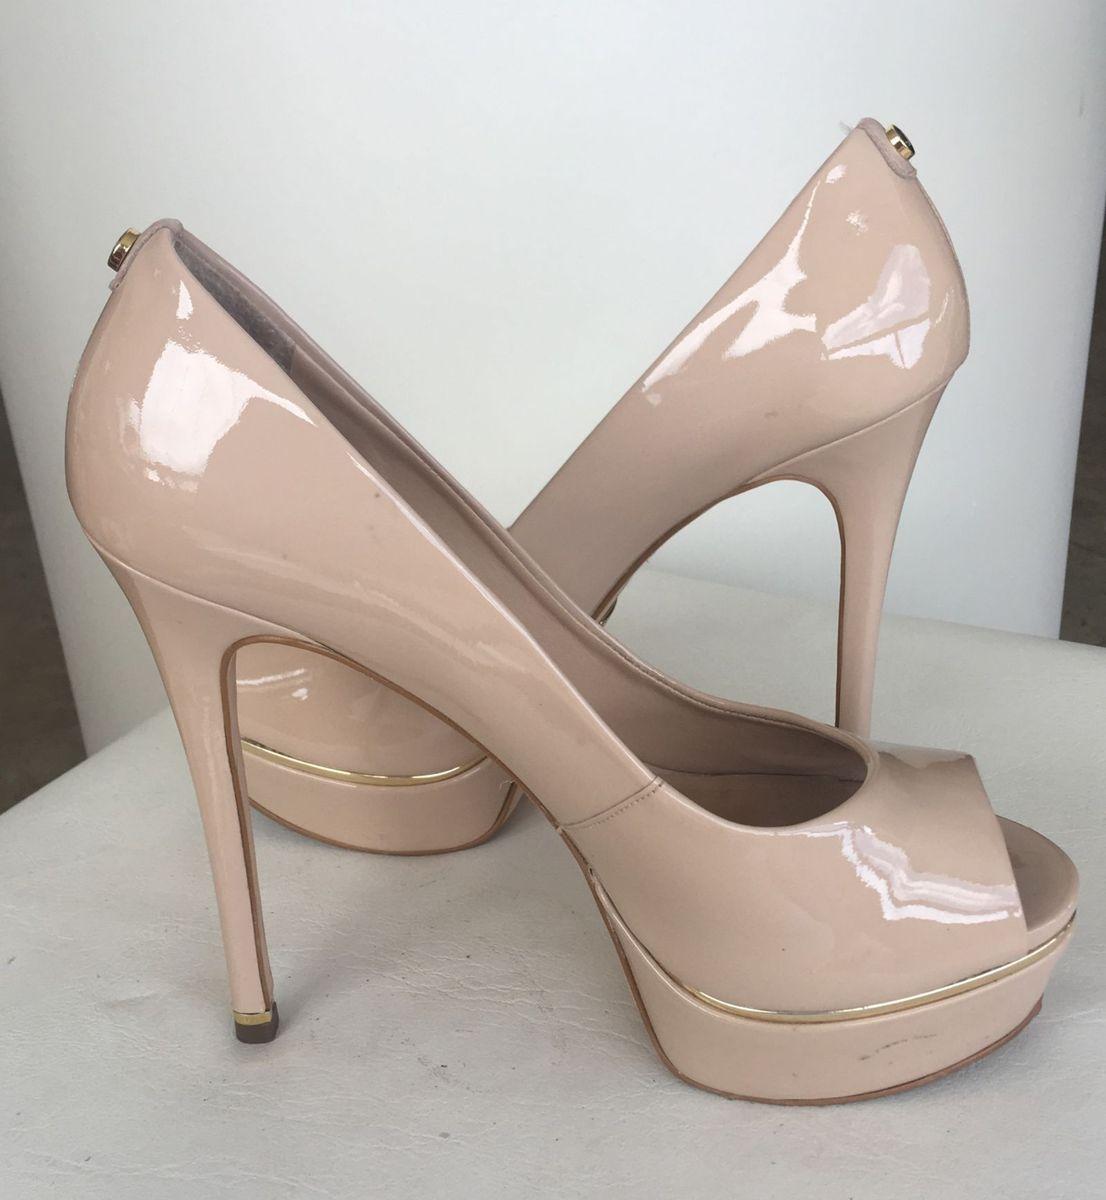 67e416d79f peep toe nude - sapatos jorge bischoff.  Czm6ly9wag90b3muzw5qb2vplmnvbs5ici9wcm9kdwn0cy82nje0nzyxl2vhntbknzu5mtvhotvhodnmzgi4mdu1njeyota5nzmylmpwzw  ...